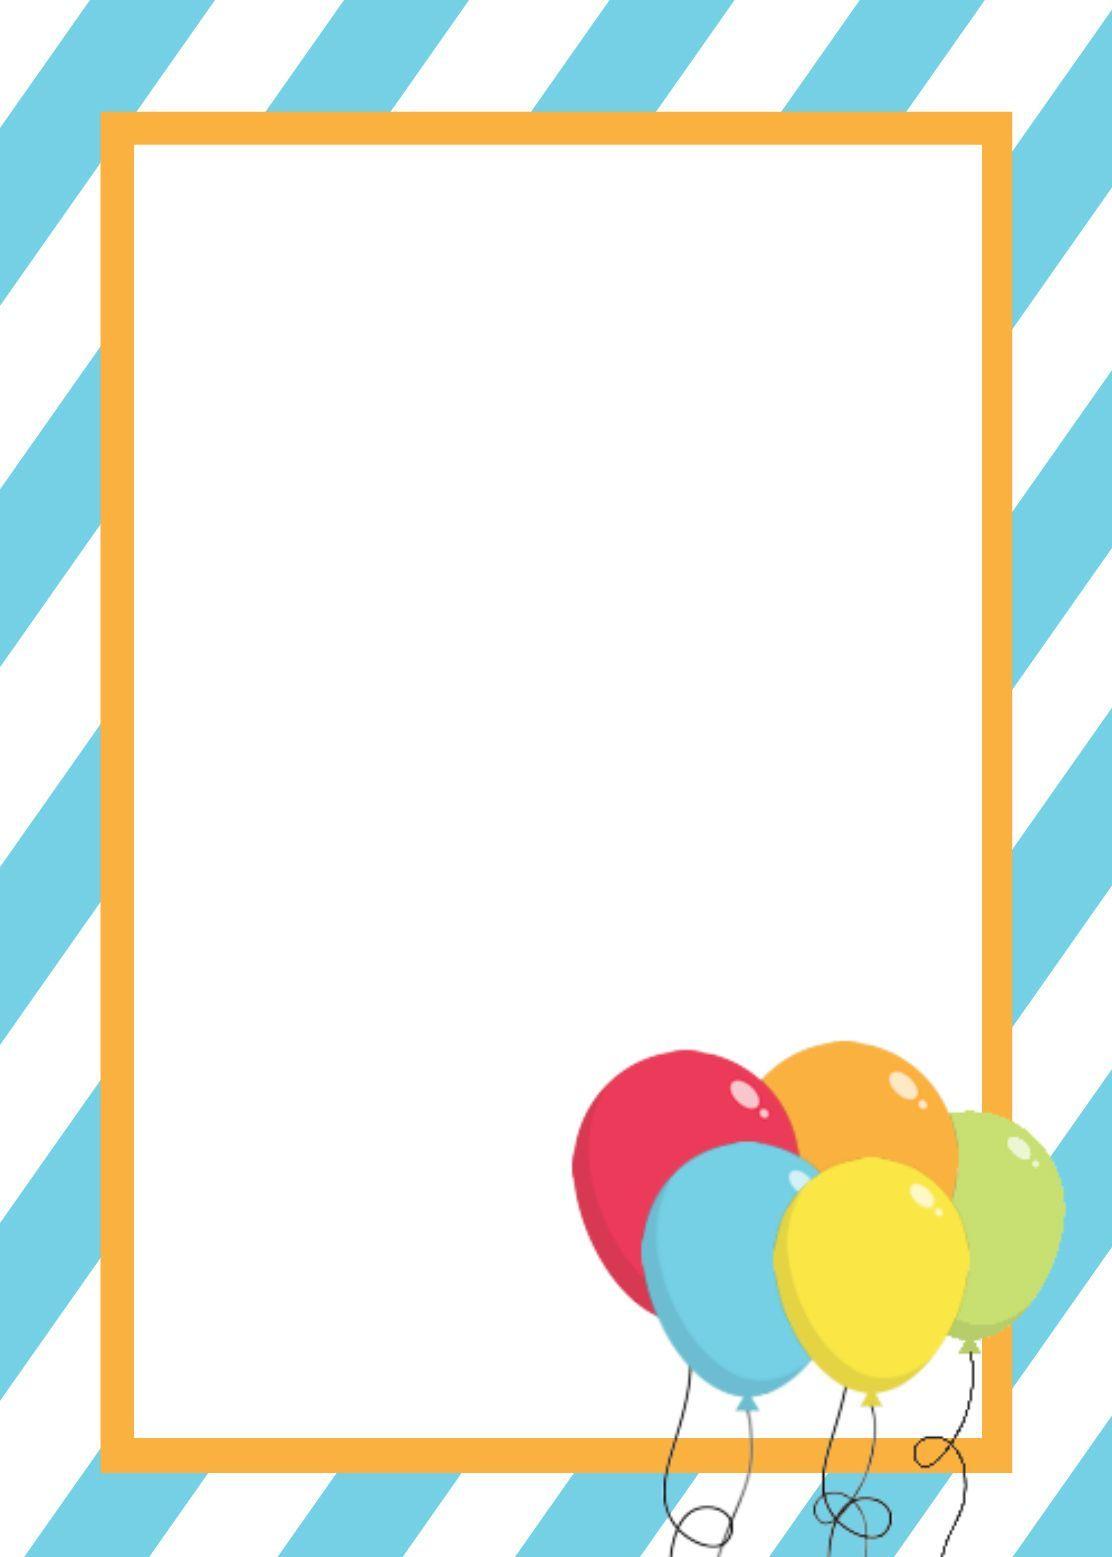 005 Microsoft Word Birthday Card Invitation Template Best Wi Printable Birthday Invitations Birthday Party Invitation Templates Free Party Invitation Templates